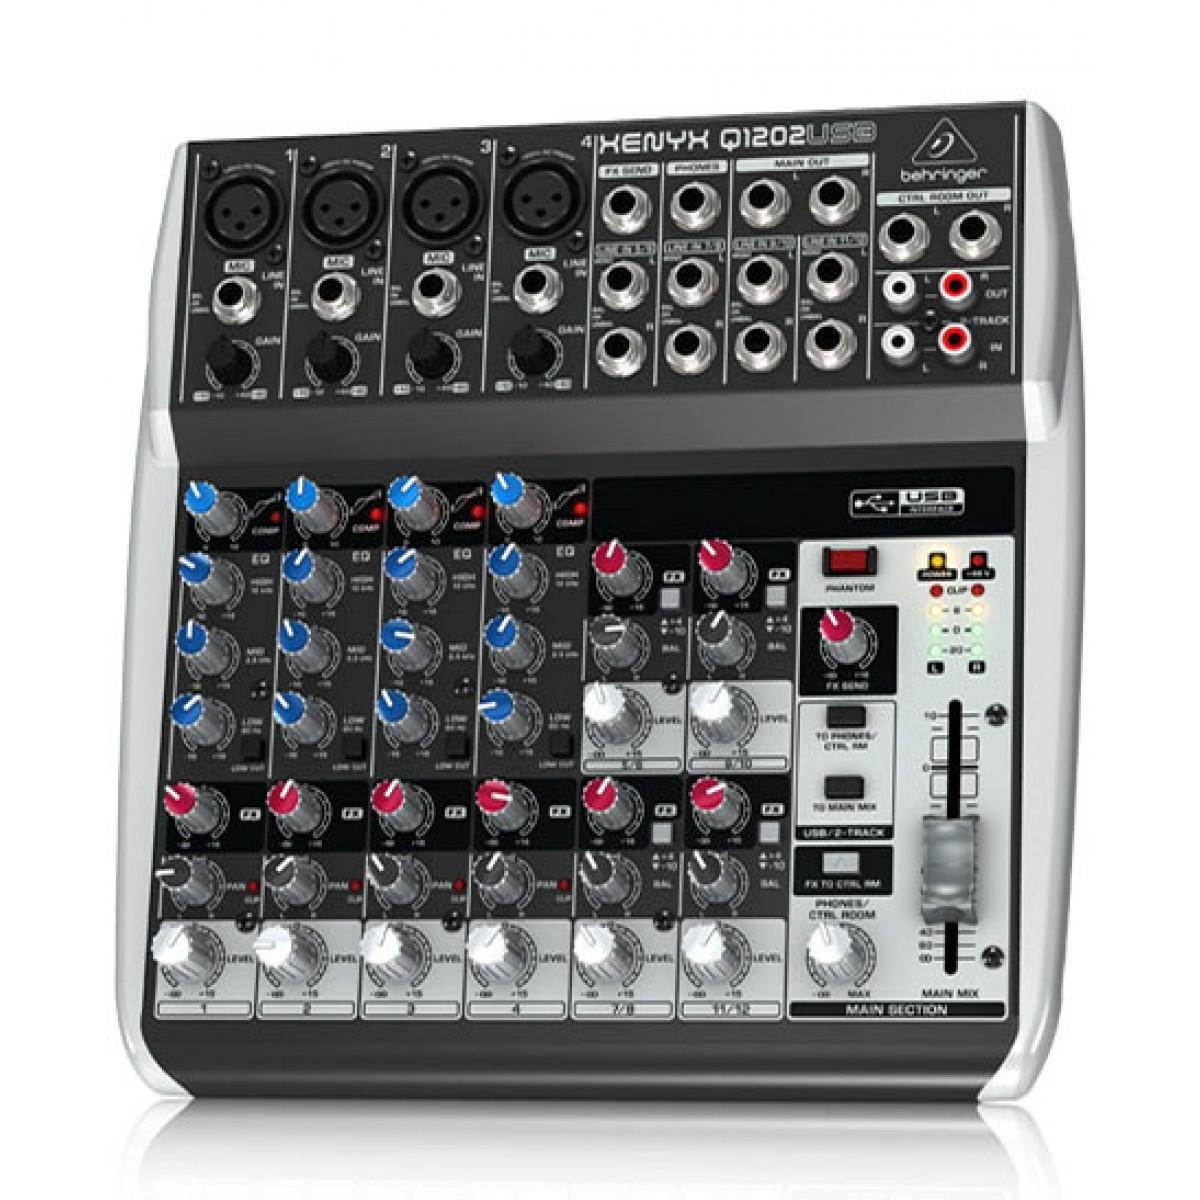 behringer xenyx q1202usb mixer 4 mono input 2 bus w kt fx usb. Black Bedroom Furniture Sets. Home Design Ideas